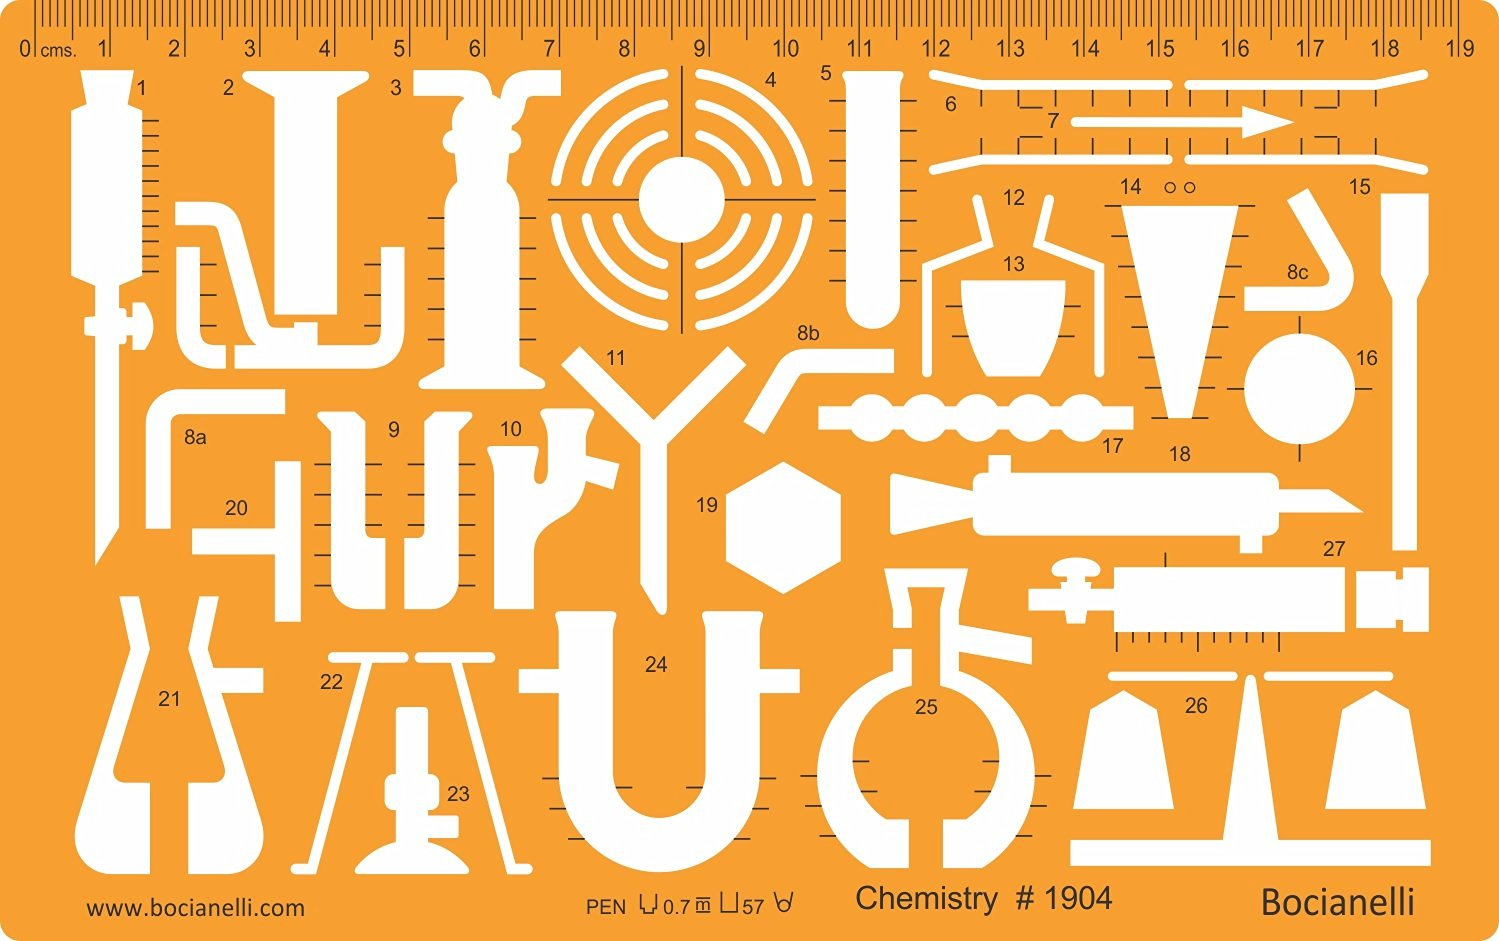 Buy chemistry lab laboratory chemical engineering equipment chemistry lab laboratory chemical engineering equipment symbols drawing template stencil buycottarizona